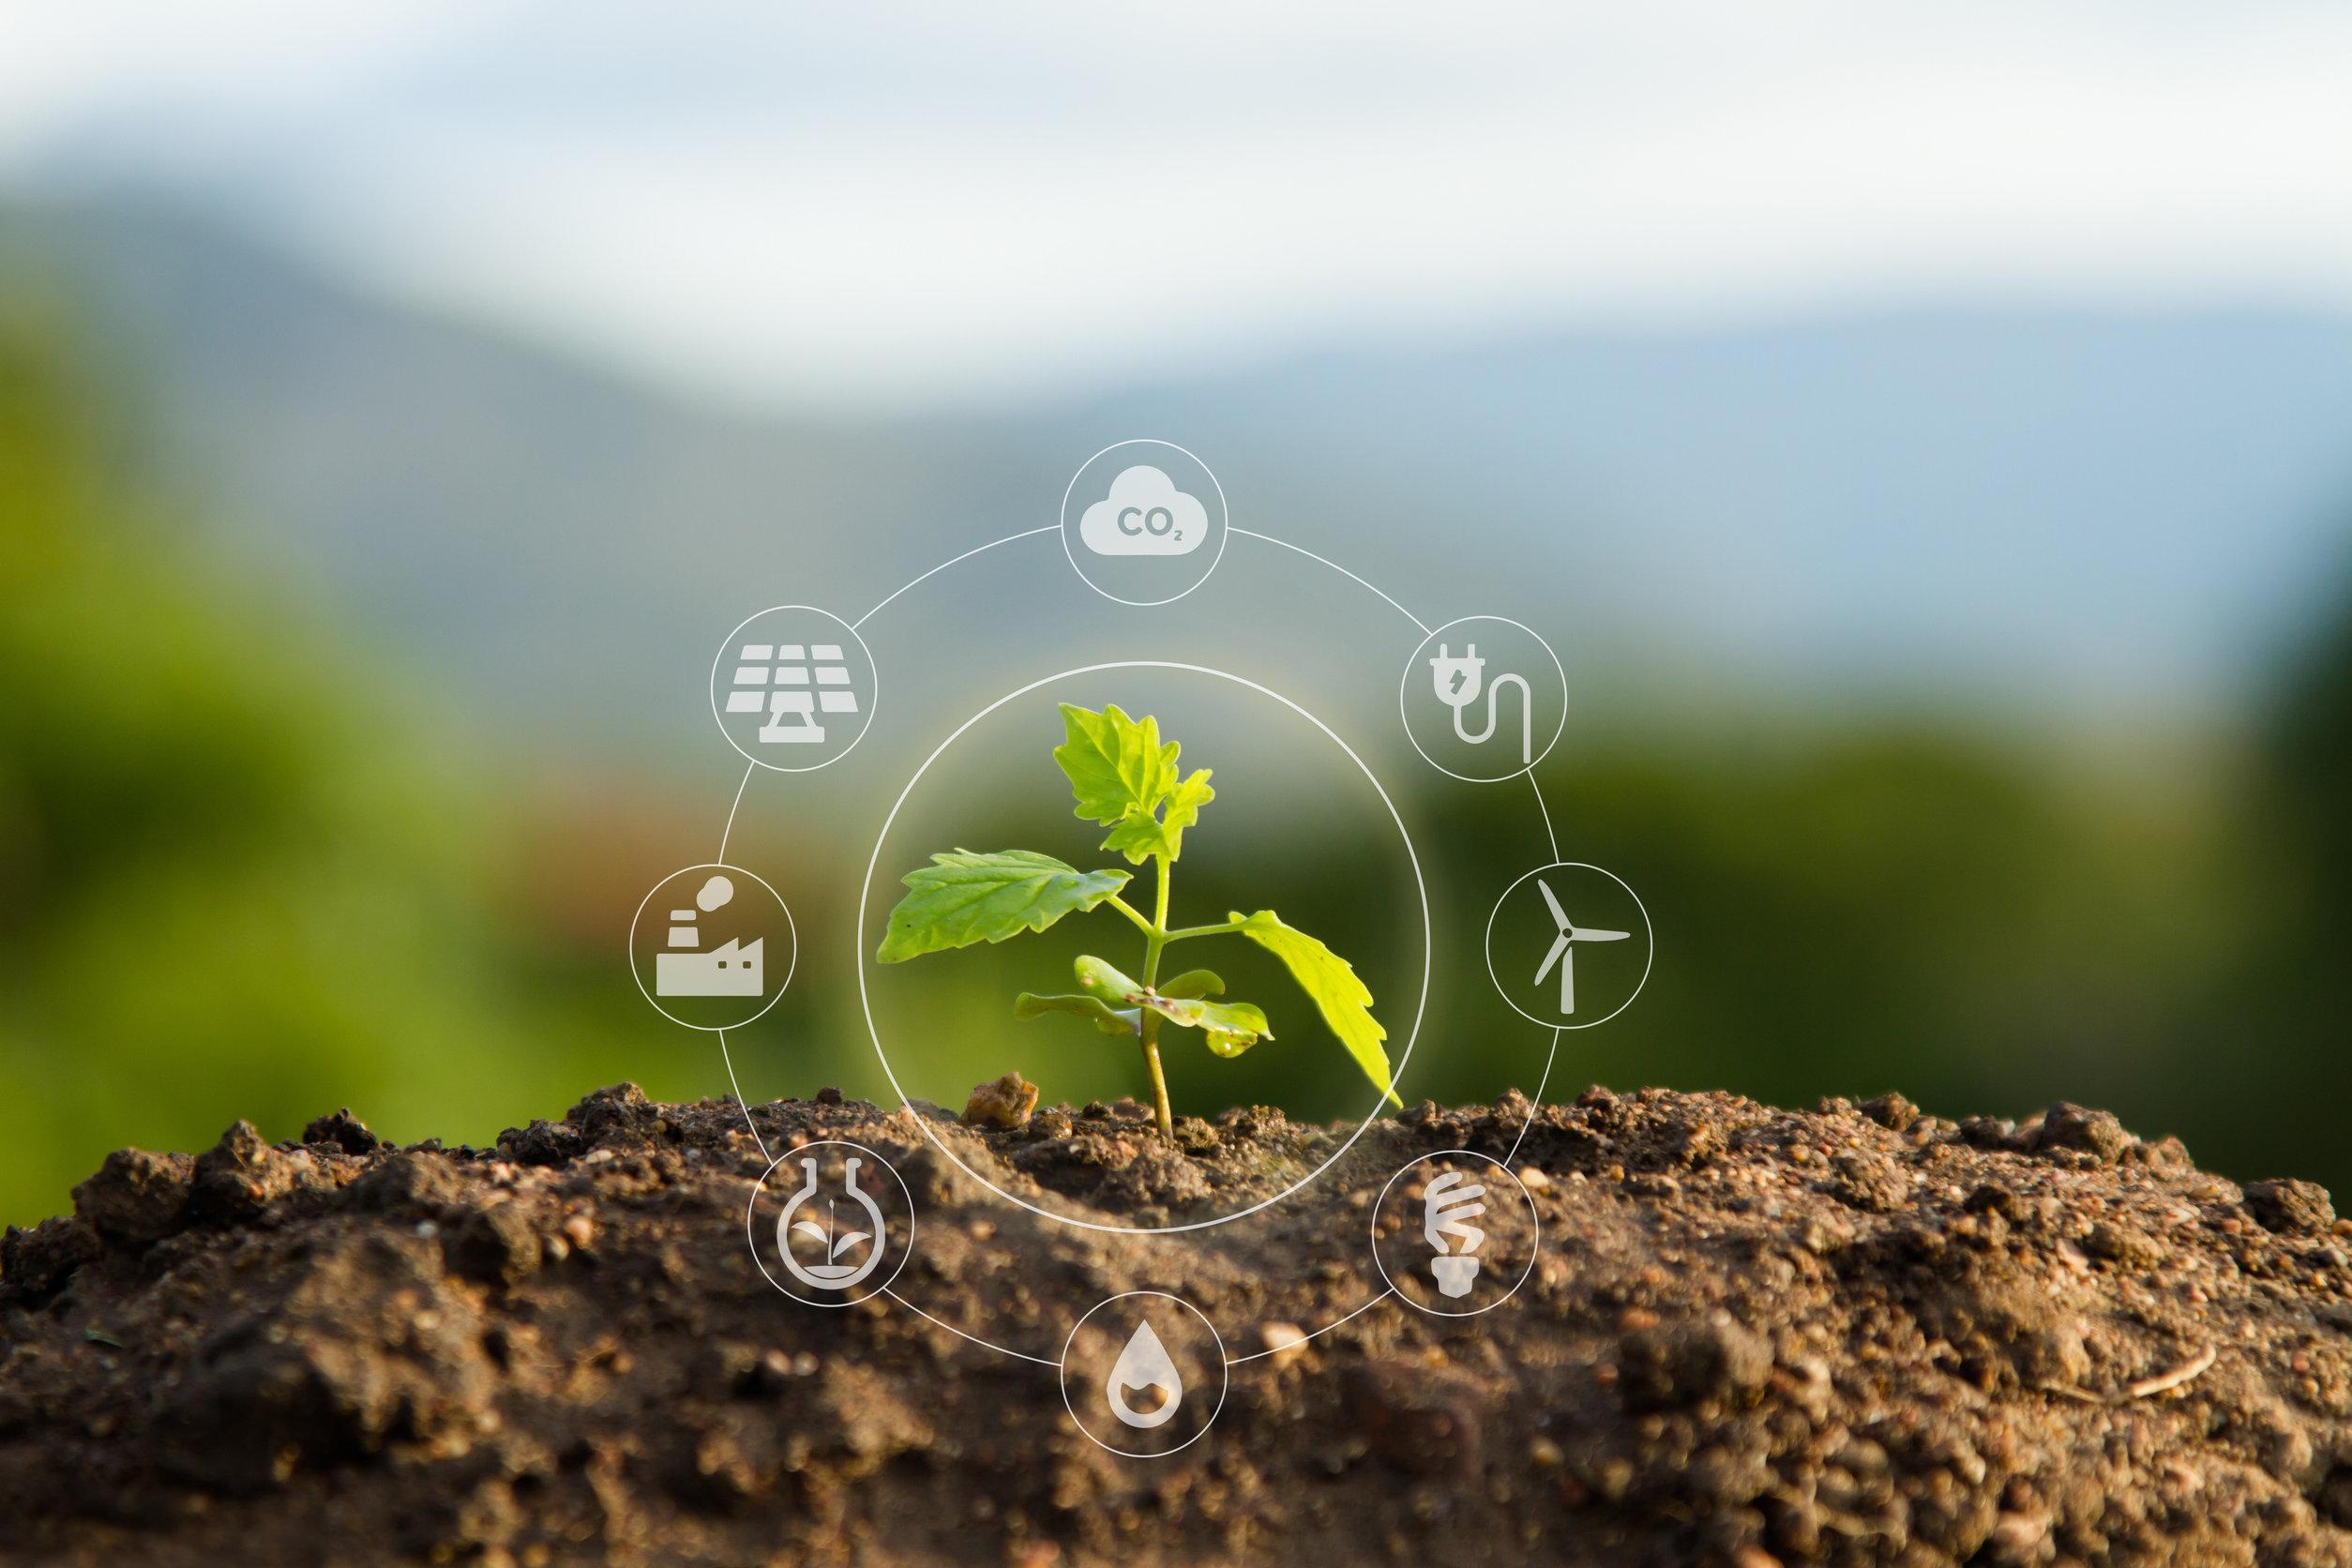 agricultura sostenible en empresas de españa